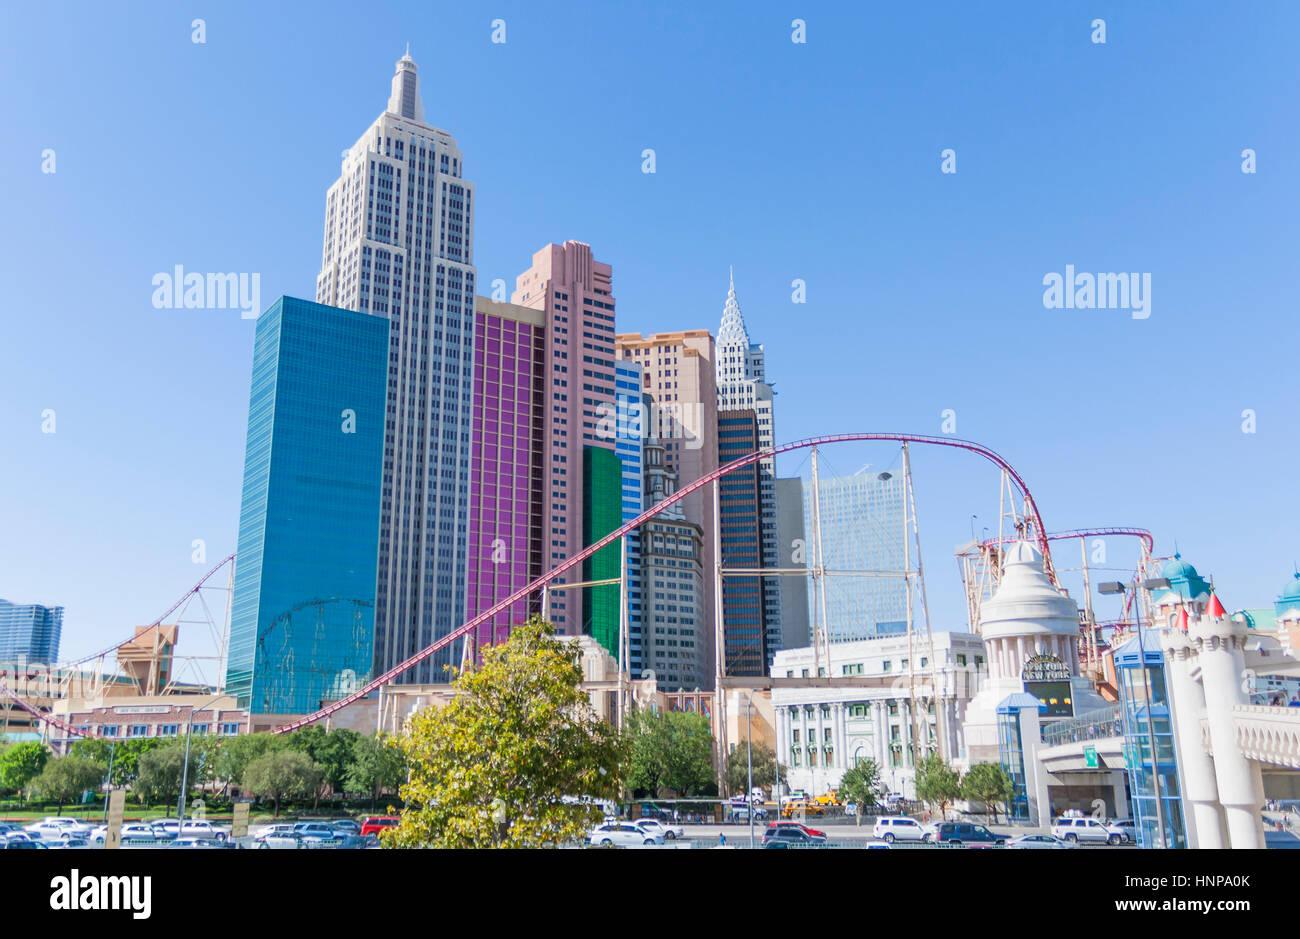 New York-New York Hotel mit Achterbahn, Strip, Las Vegas Boulevard South, Paradies, Las Vegas, Nevada, USA. Stockbild